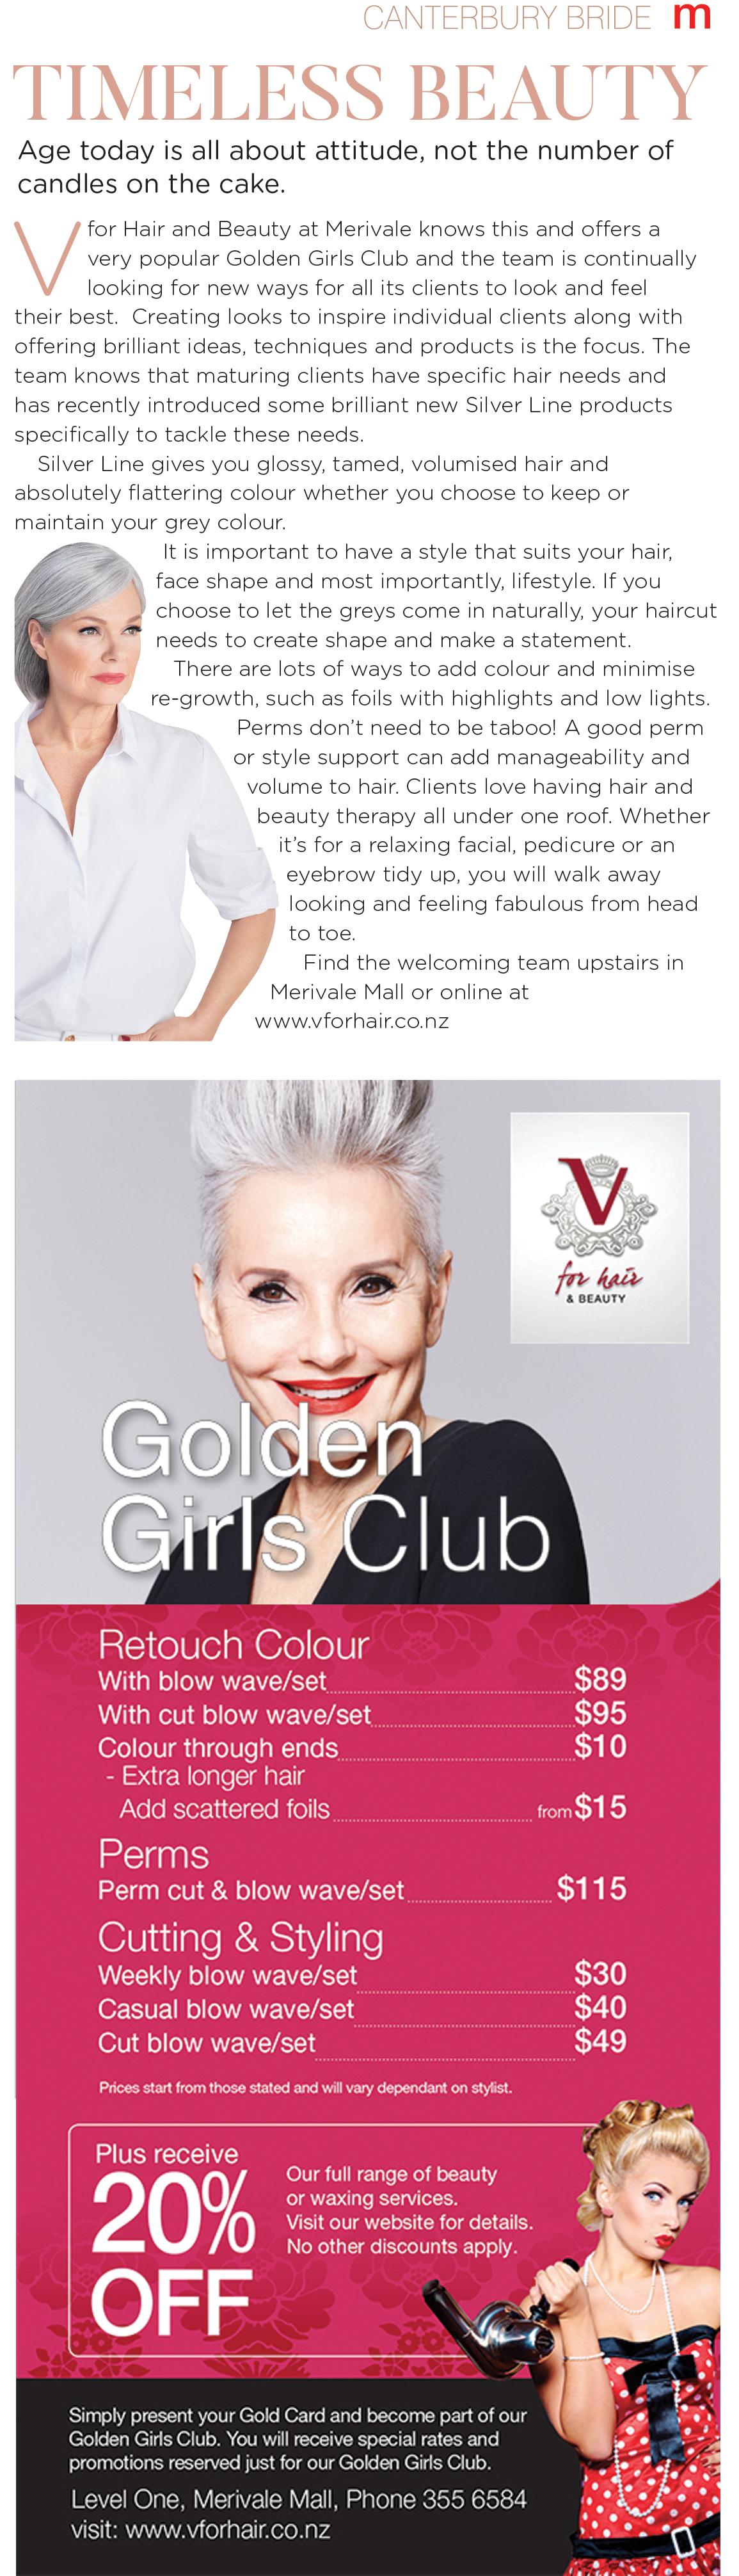 Golden Girls Club